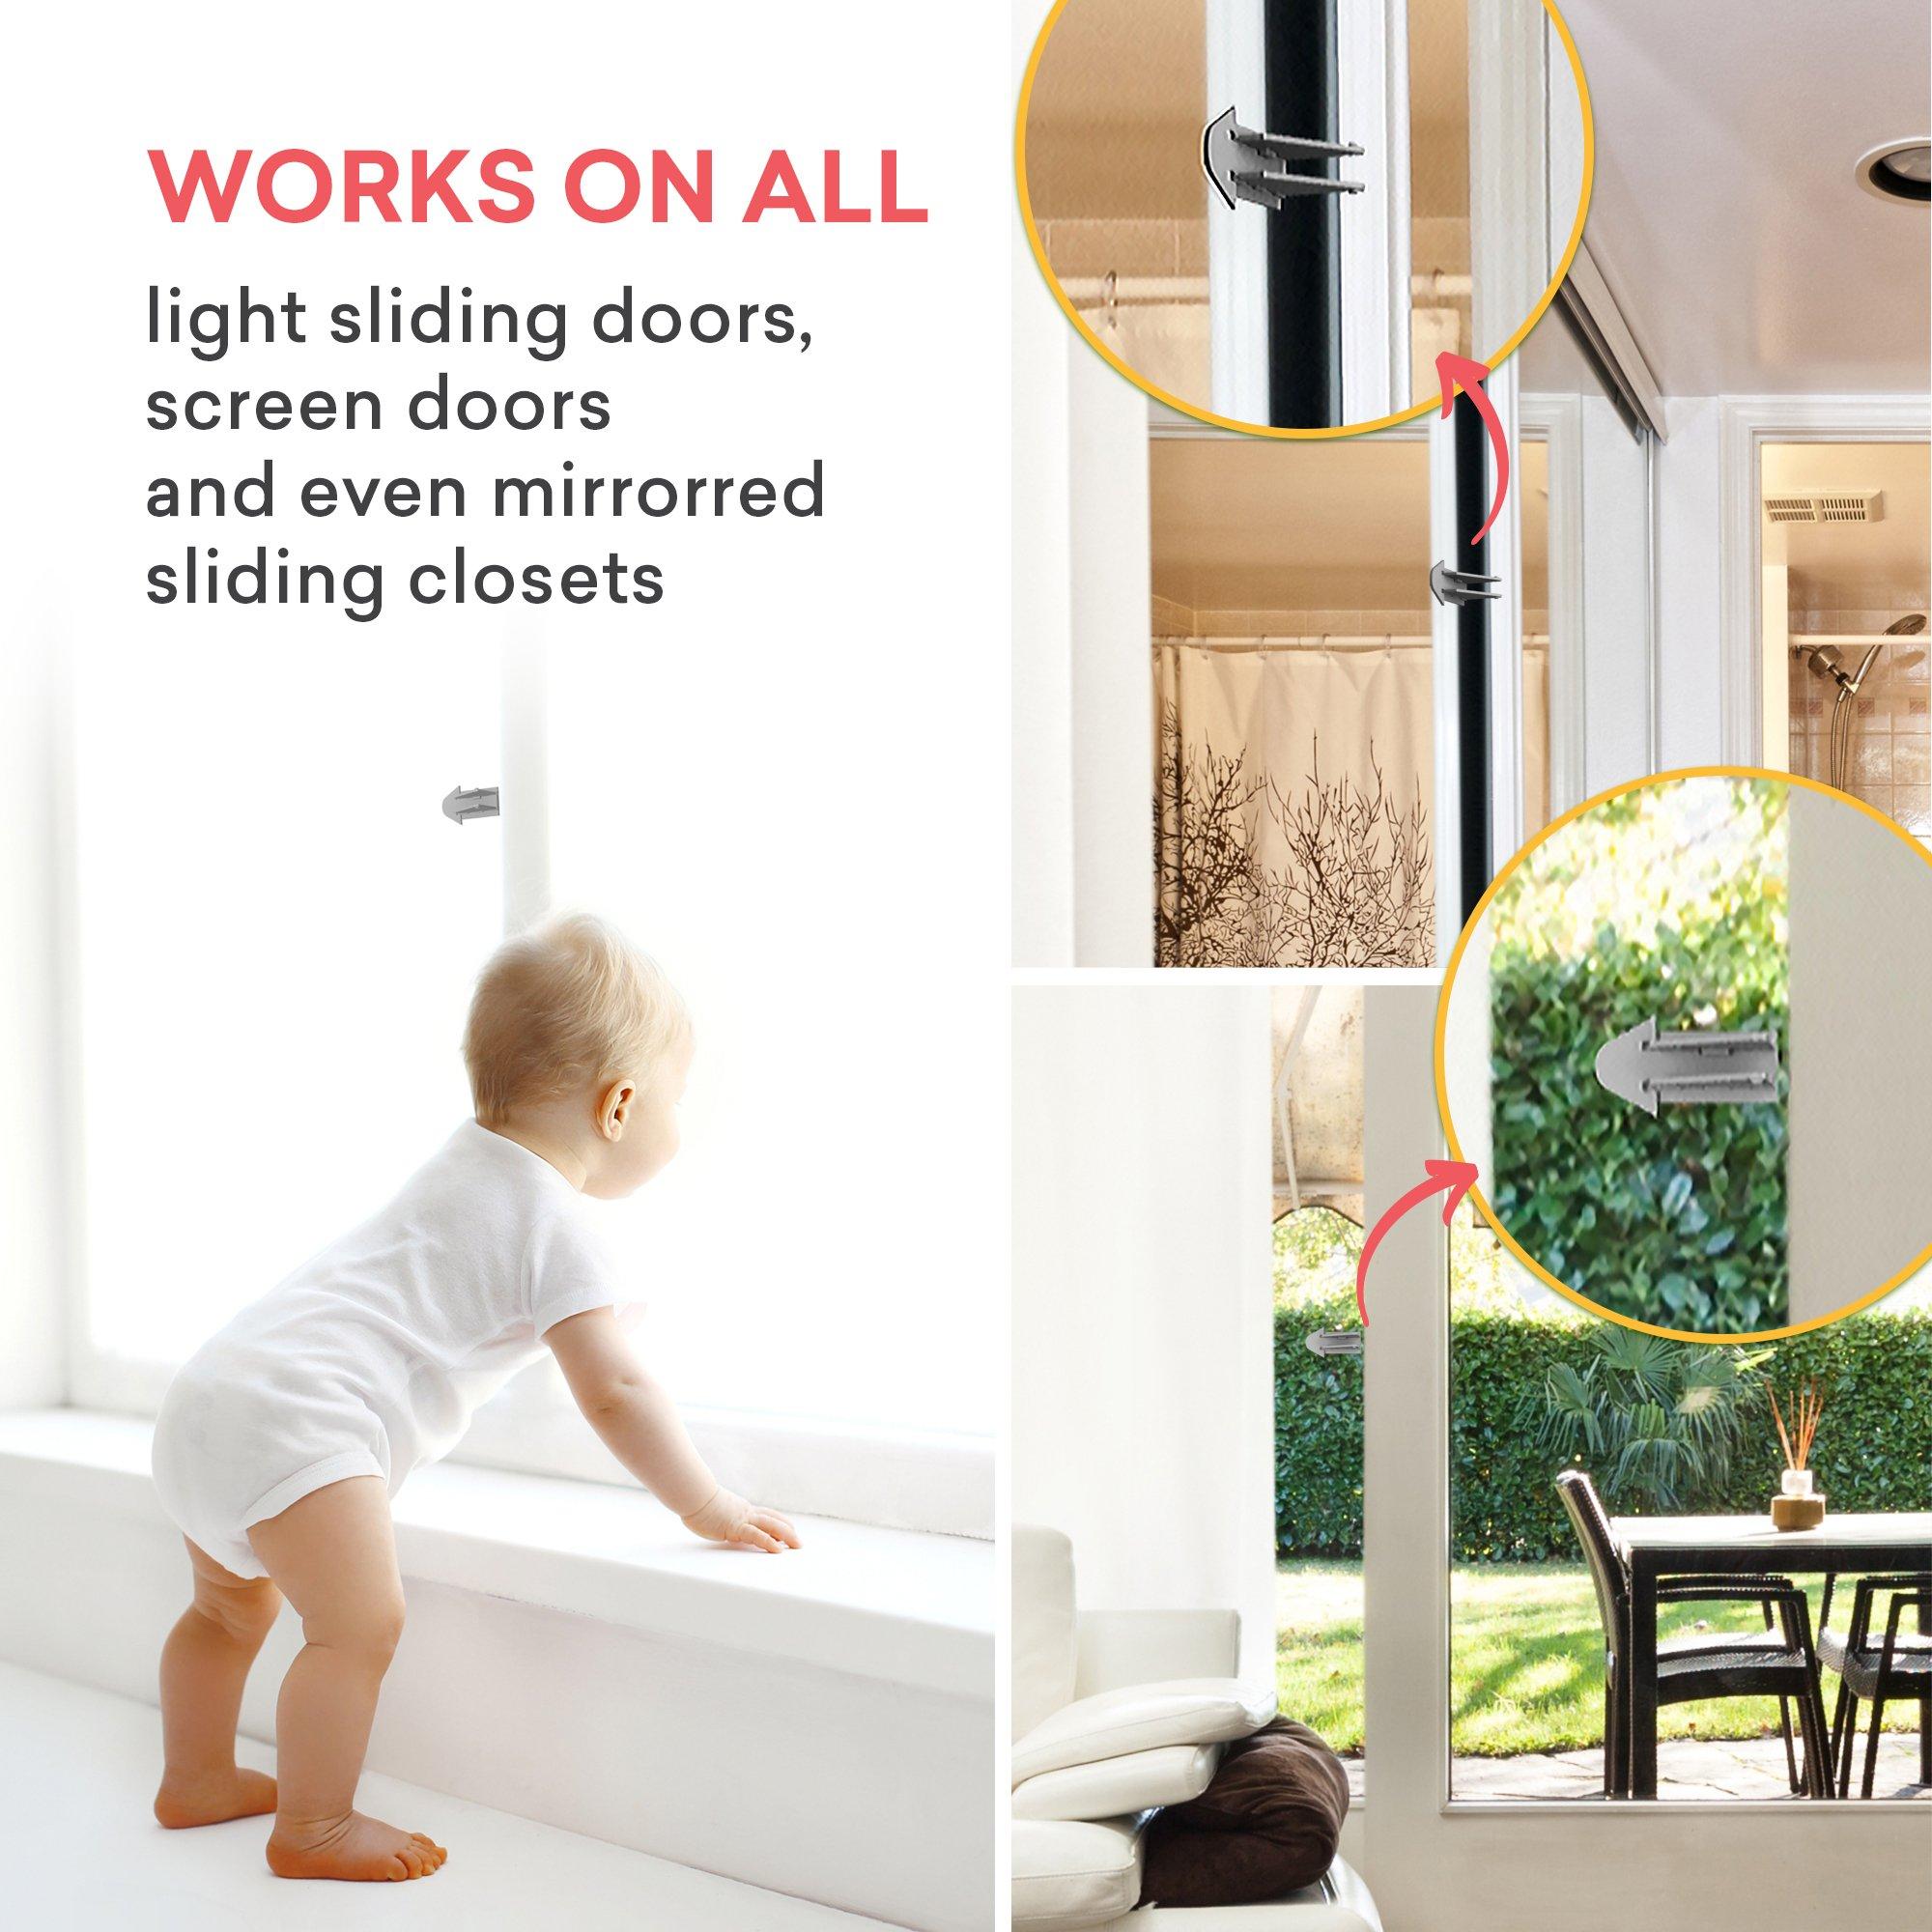 3m Adhesive Sliding Door Lock For Patio Closet Windows Rv Baby